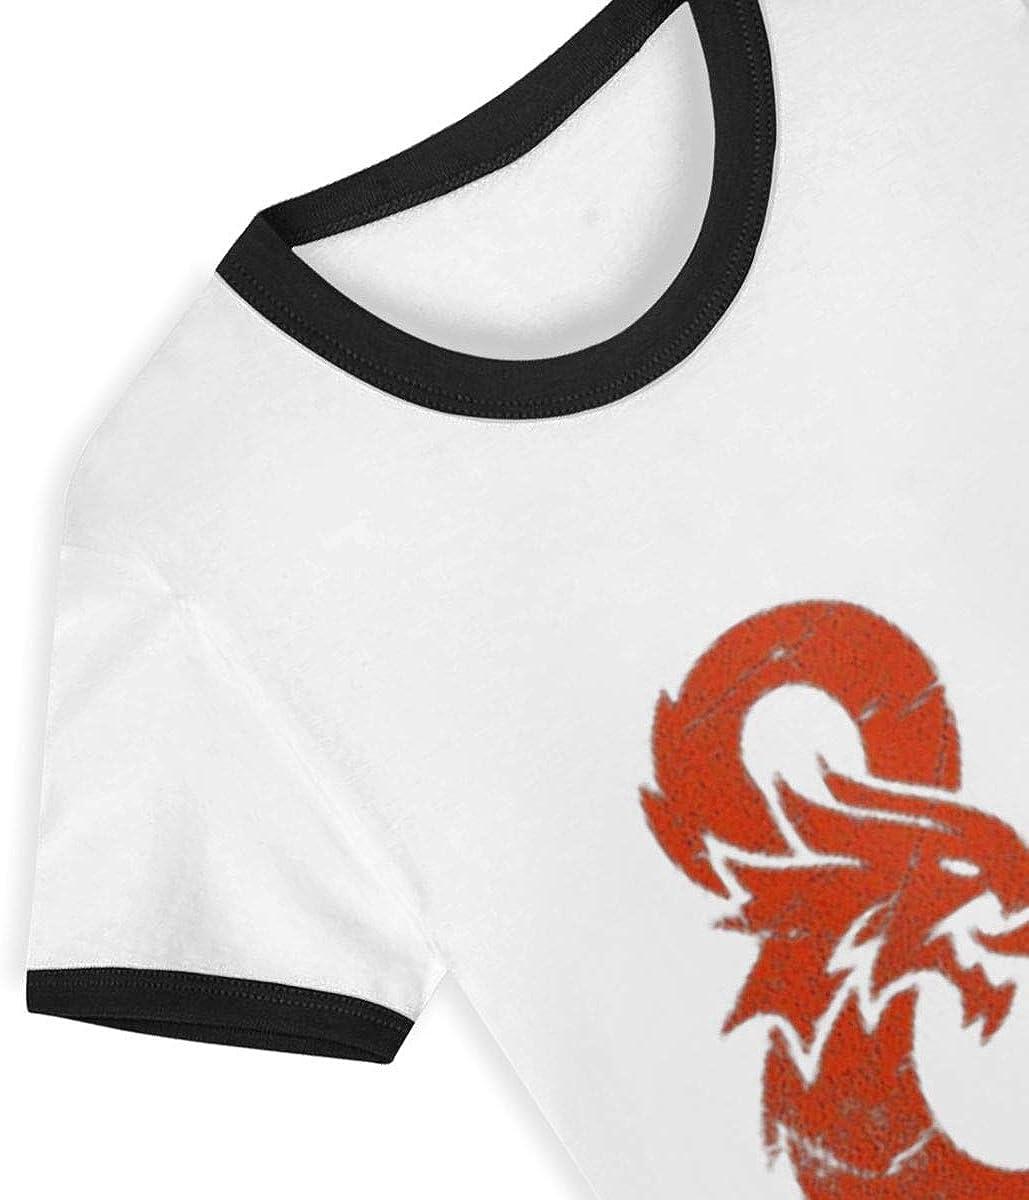 CY SHOP D/&D Bot Discord Bots Childrens Boys Girls Contrast Short Sleeve T-Shirt